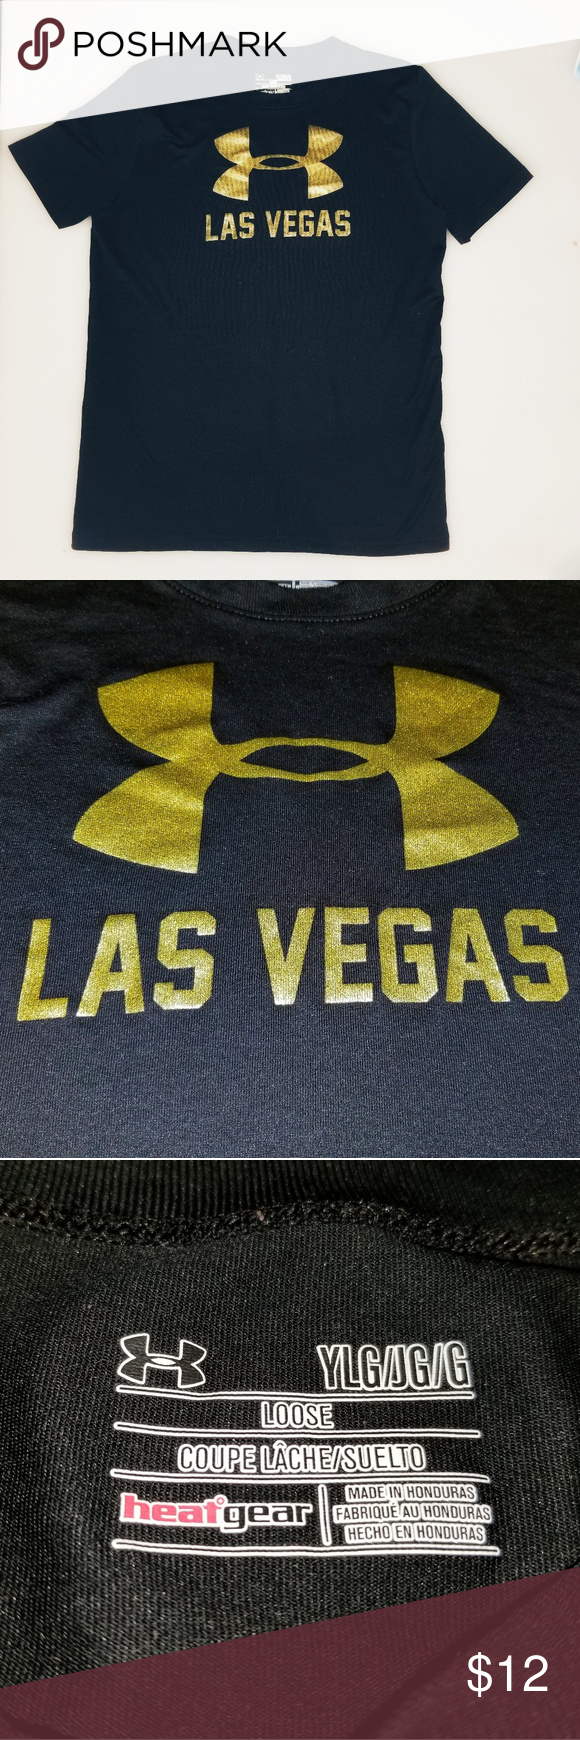 Under Armour Heatgear Las Vegas Short Sleeve Large Under Armour Under Armour Shirts Short Sleeve